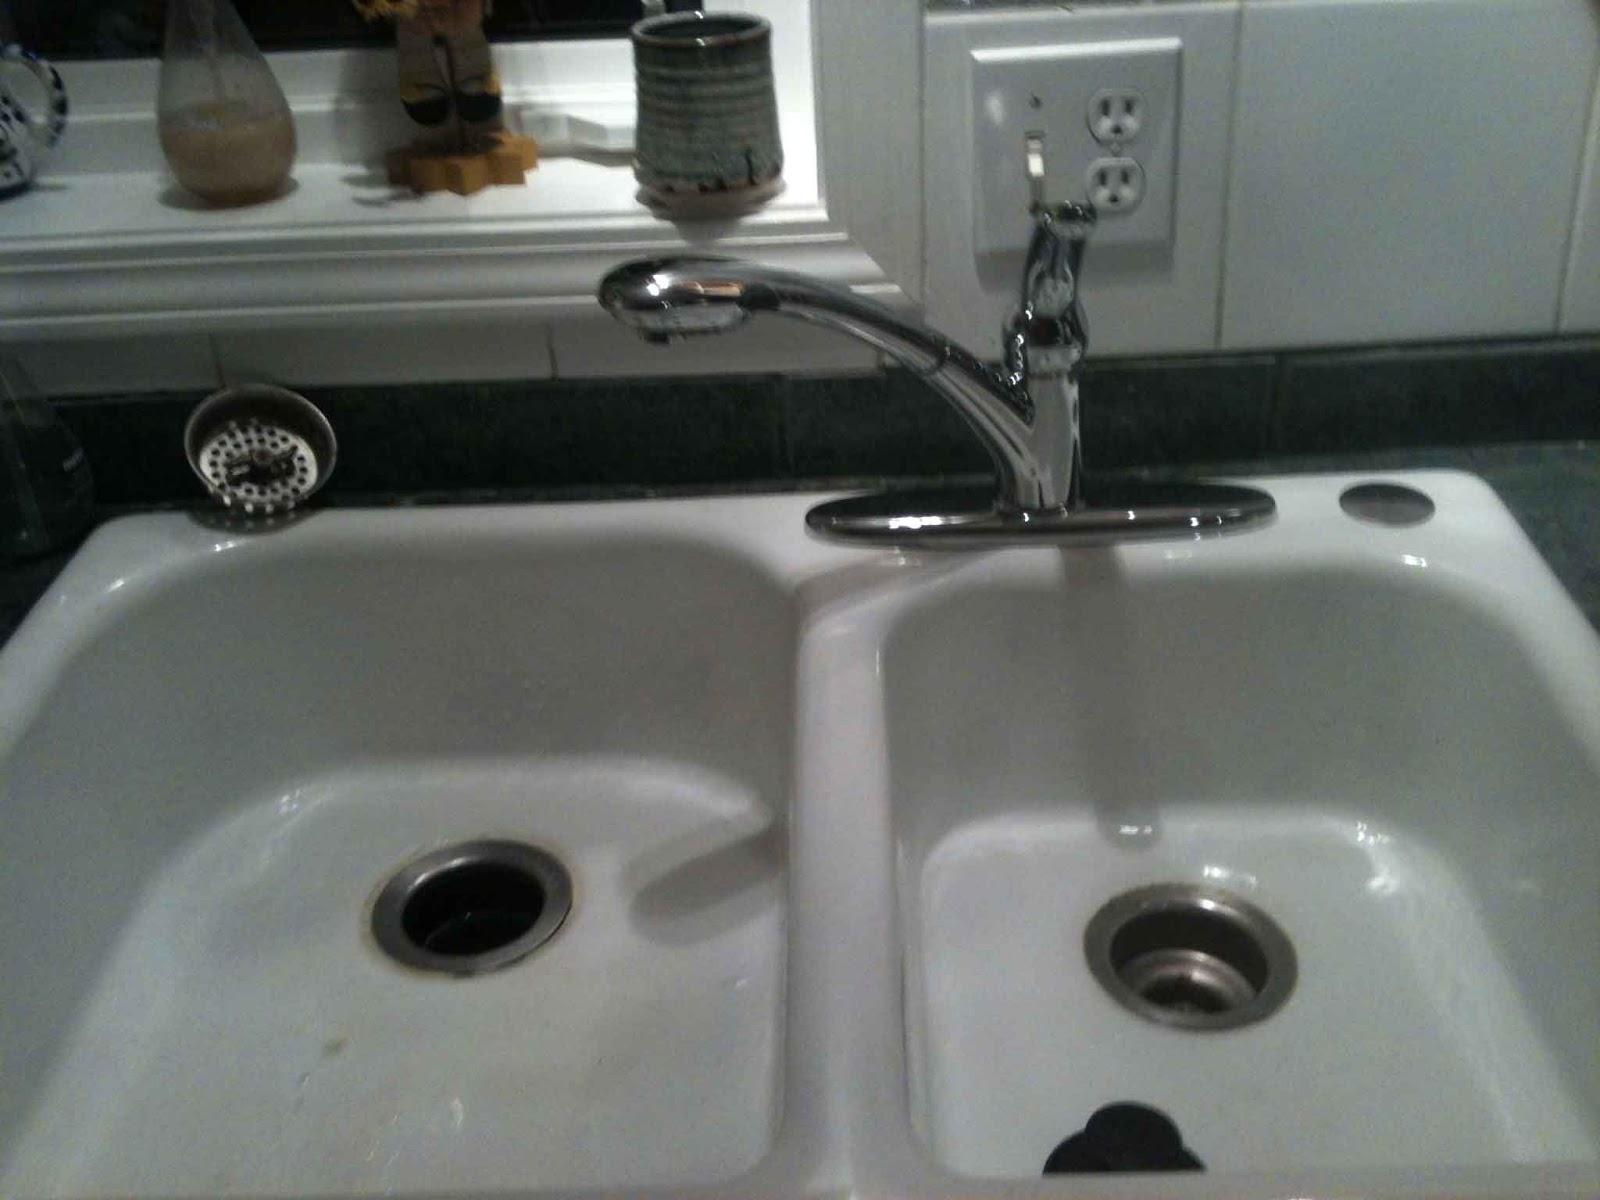 About Ball Plumbing: Blaine Kitchen Faucet